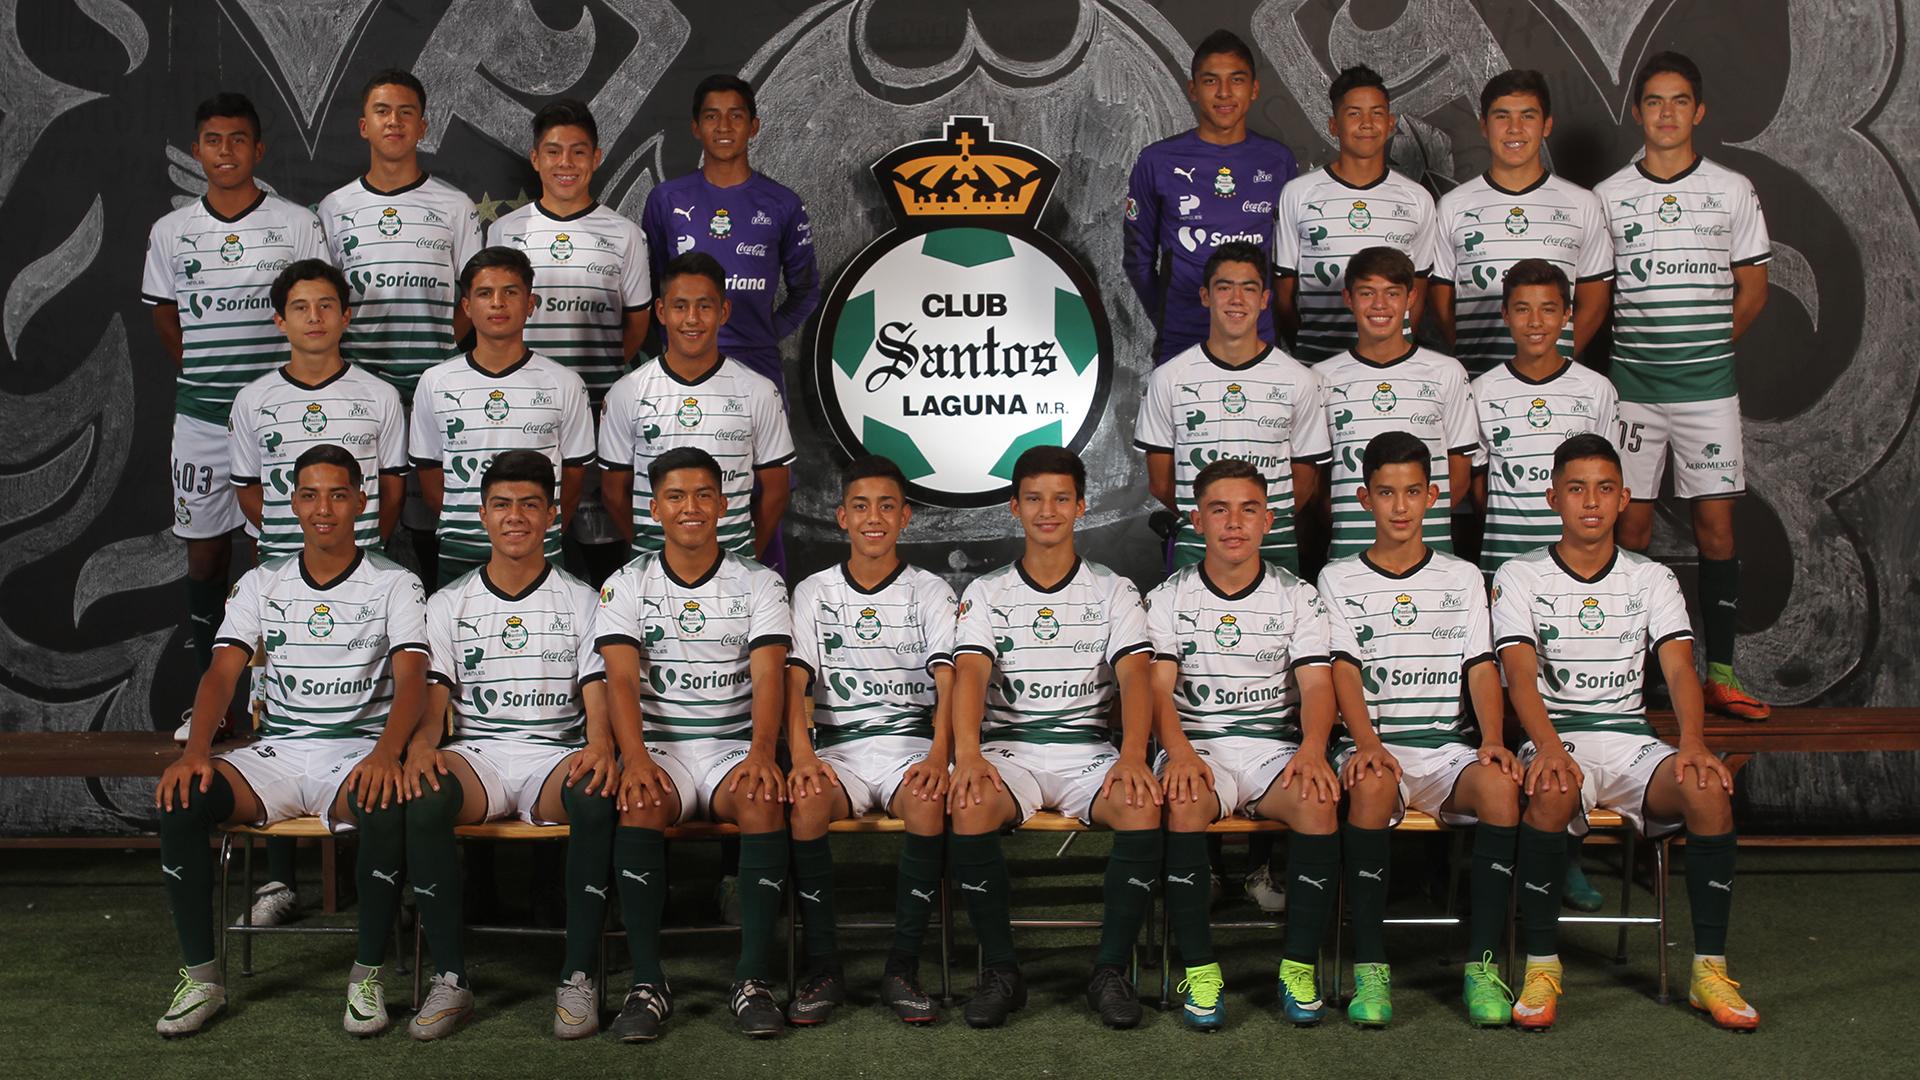 Club Santos Laguna Sub 15